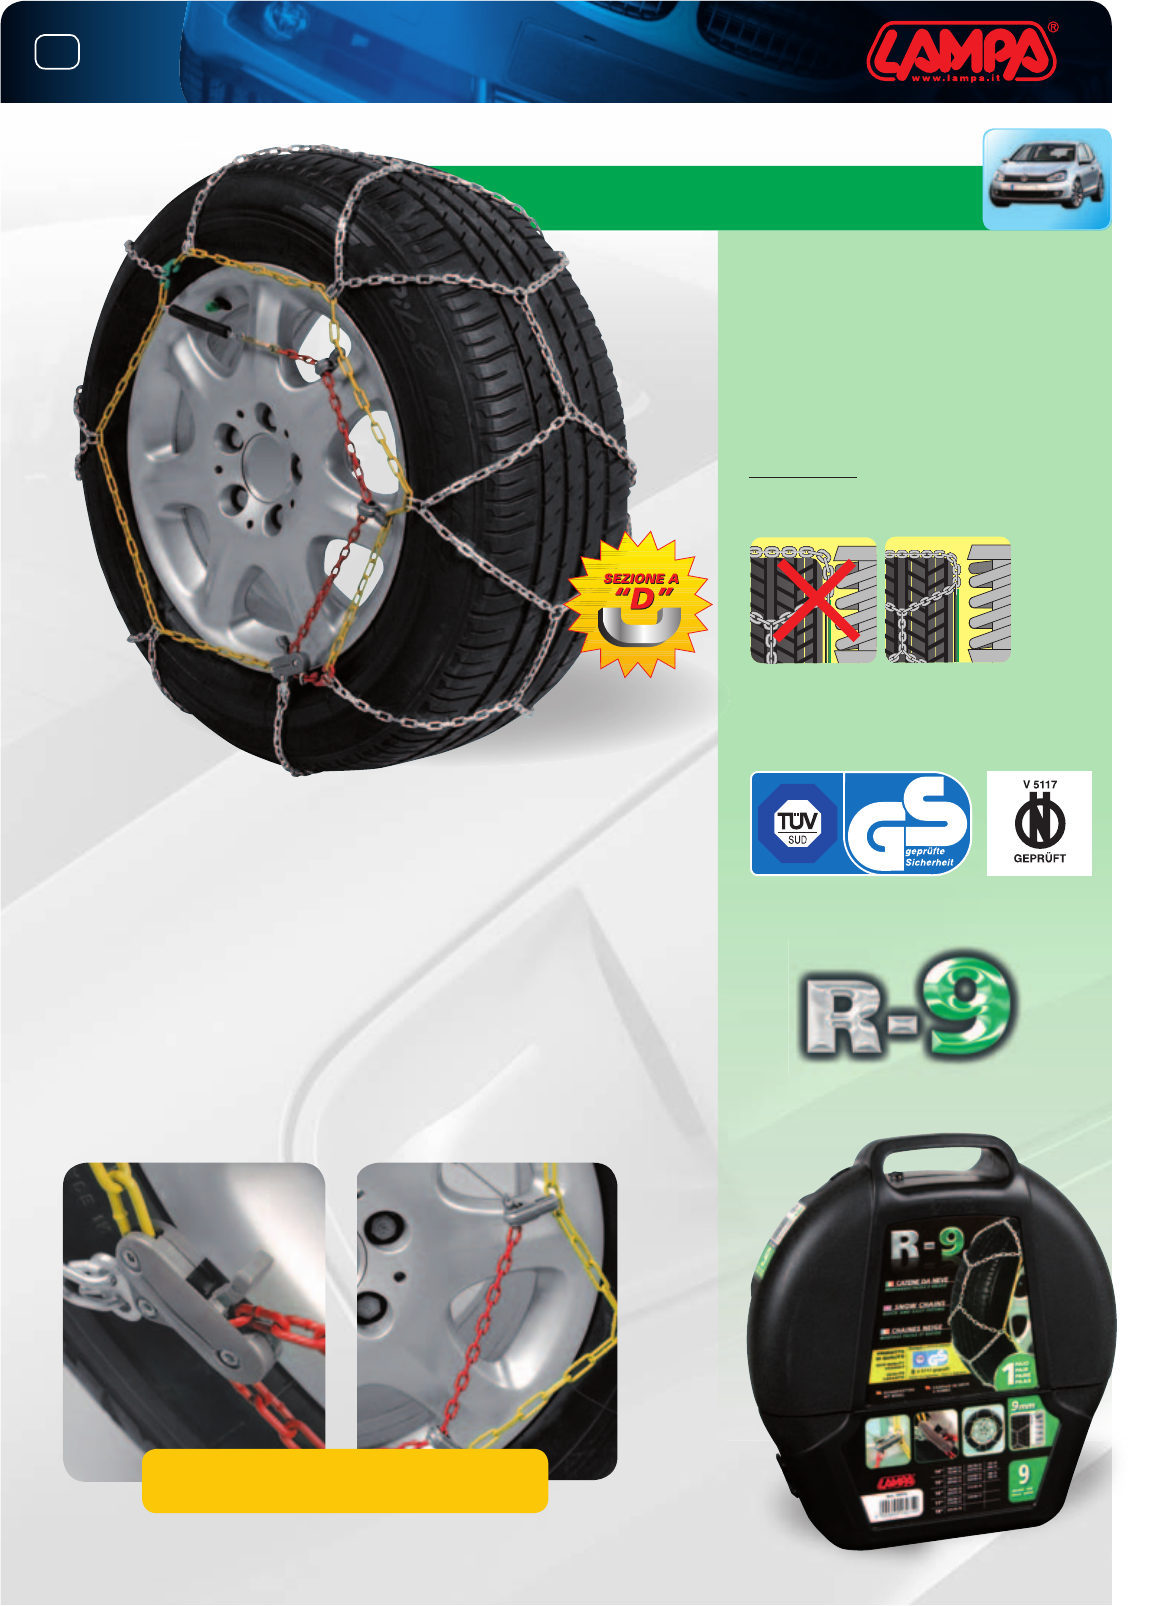 26,5 FUORISTRADA omologate misura 265//40-21 CATENE DA NEVE 12 mm a ROMBO SUV